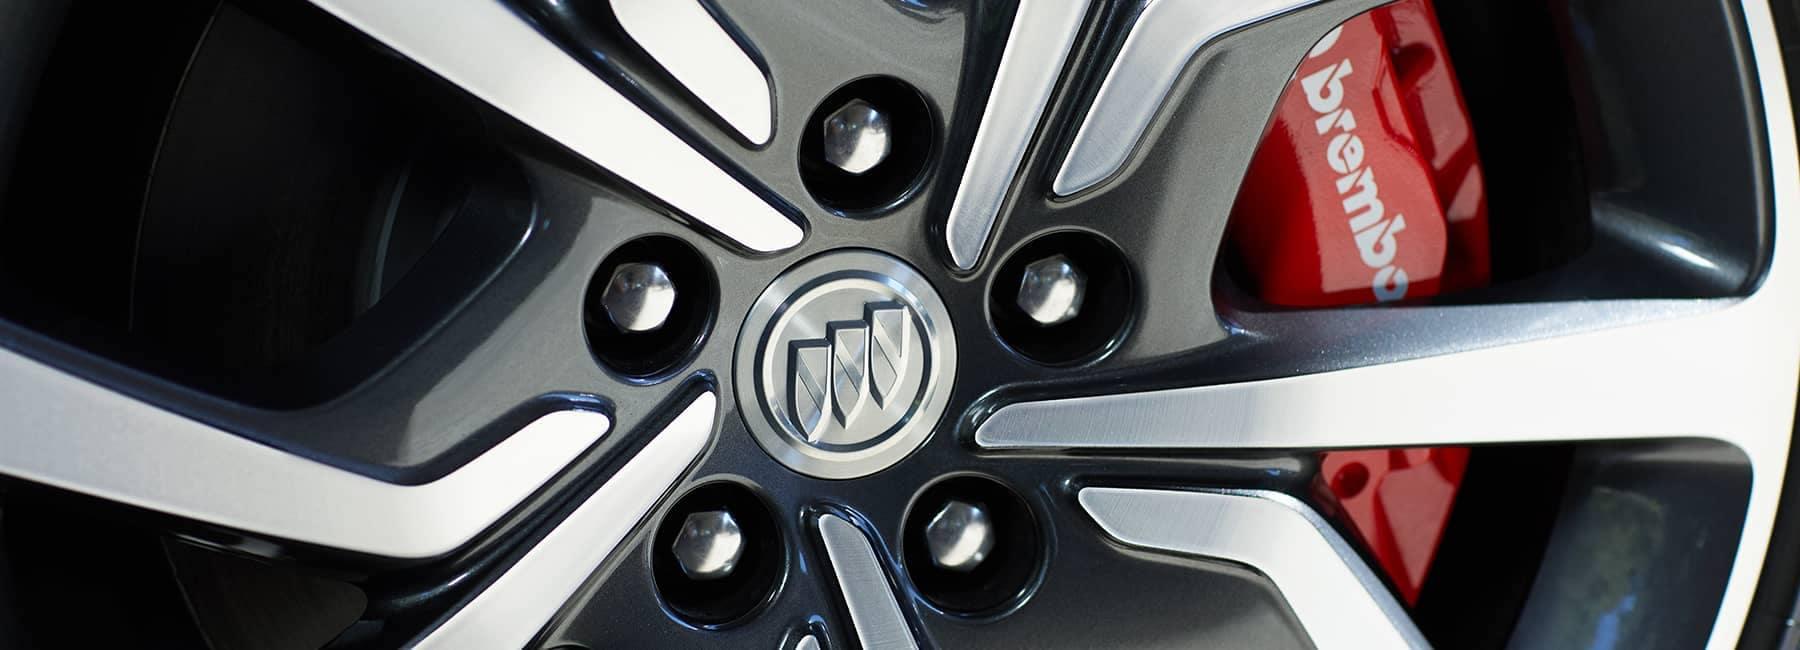 Buick Banner Image - 2020 Buick Regal Sportback Tire Rim Closeup